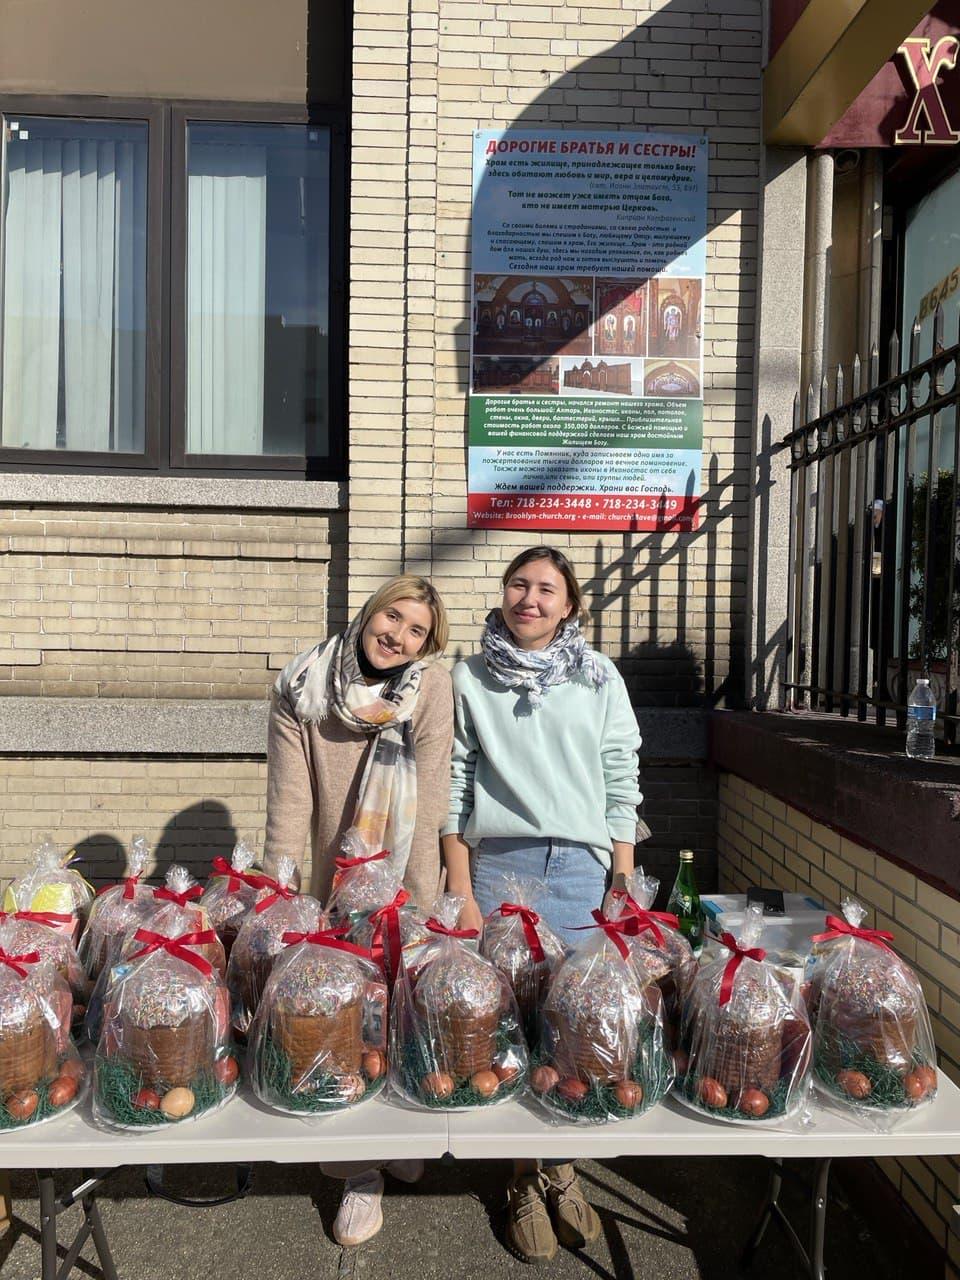 Easter_Brooklyn-Church_2021-5-02_07